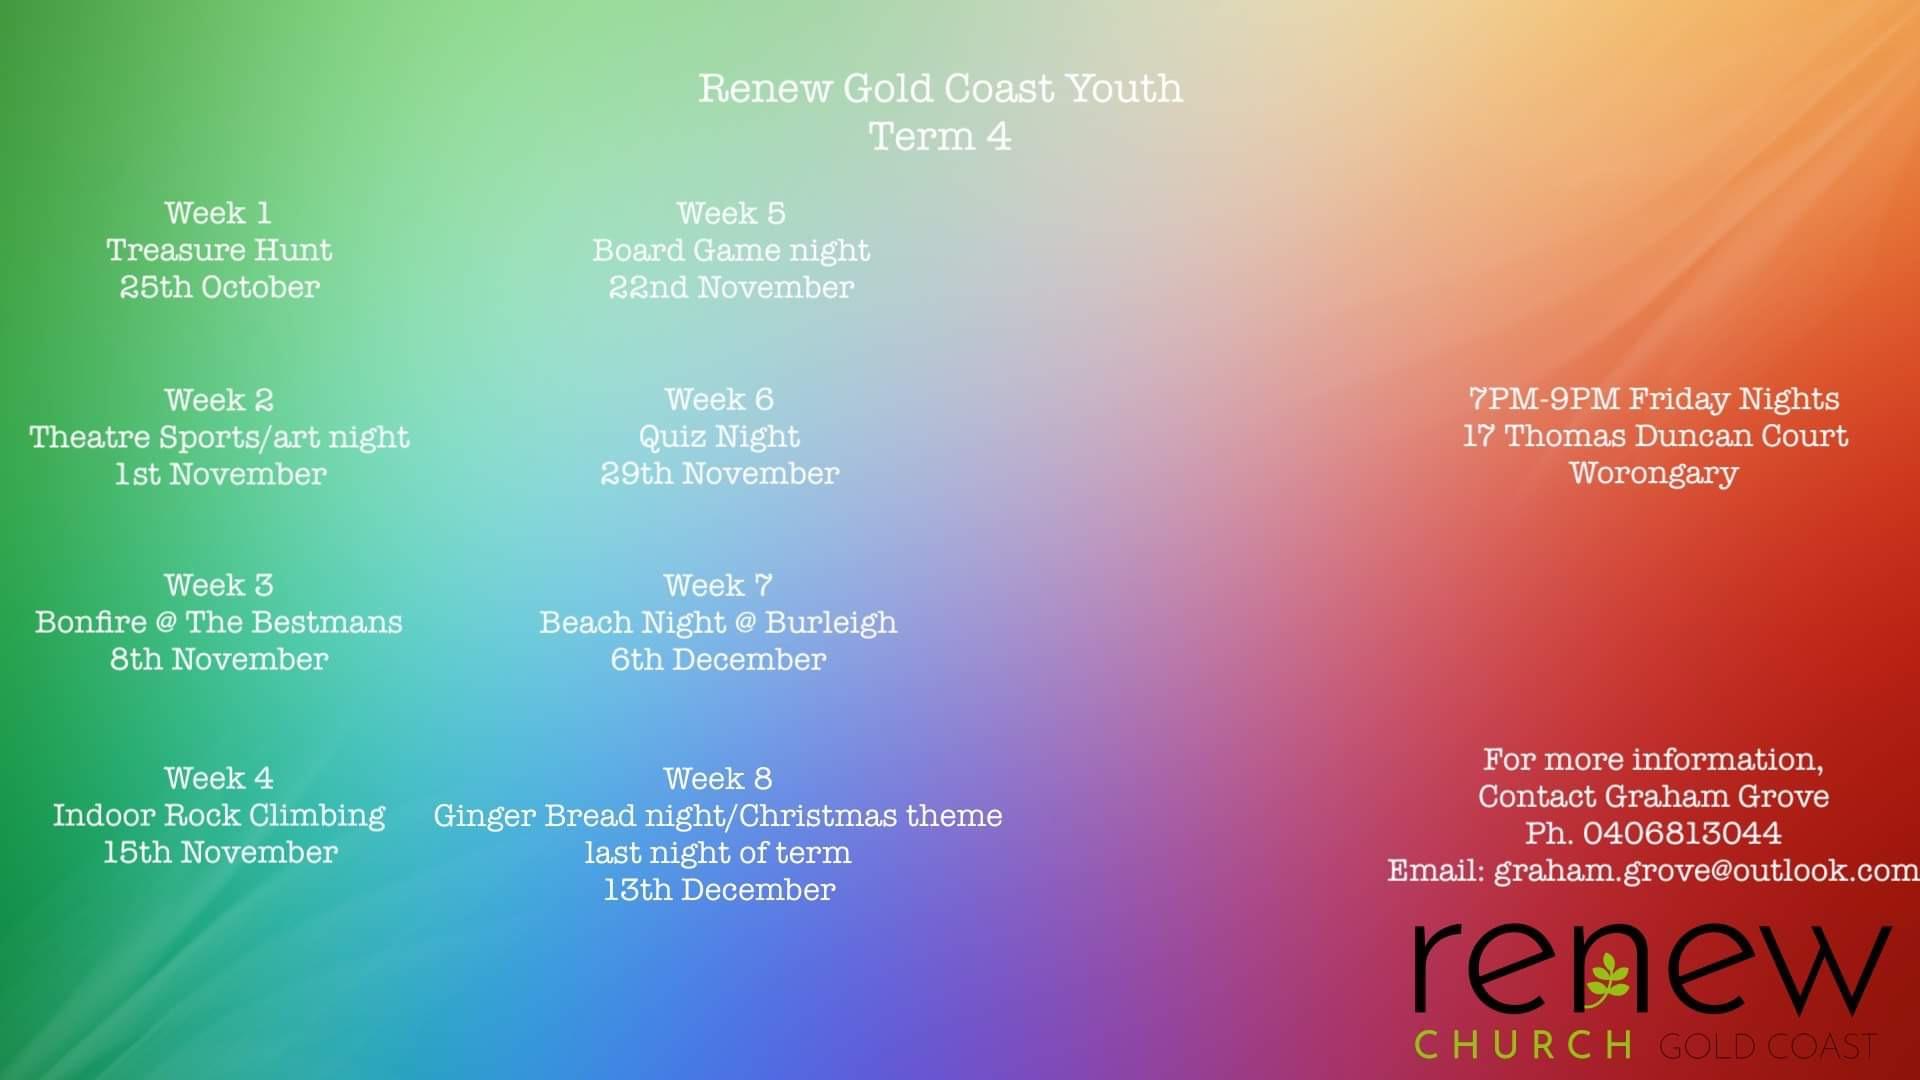 2019-10 Renew Youth Term 4 Activities